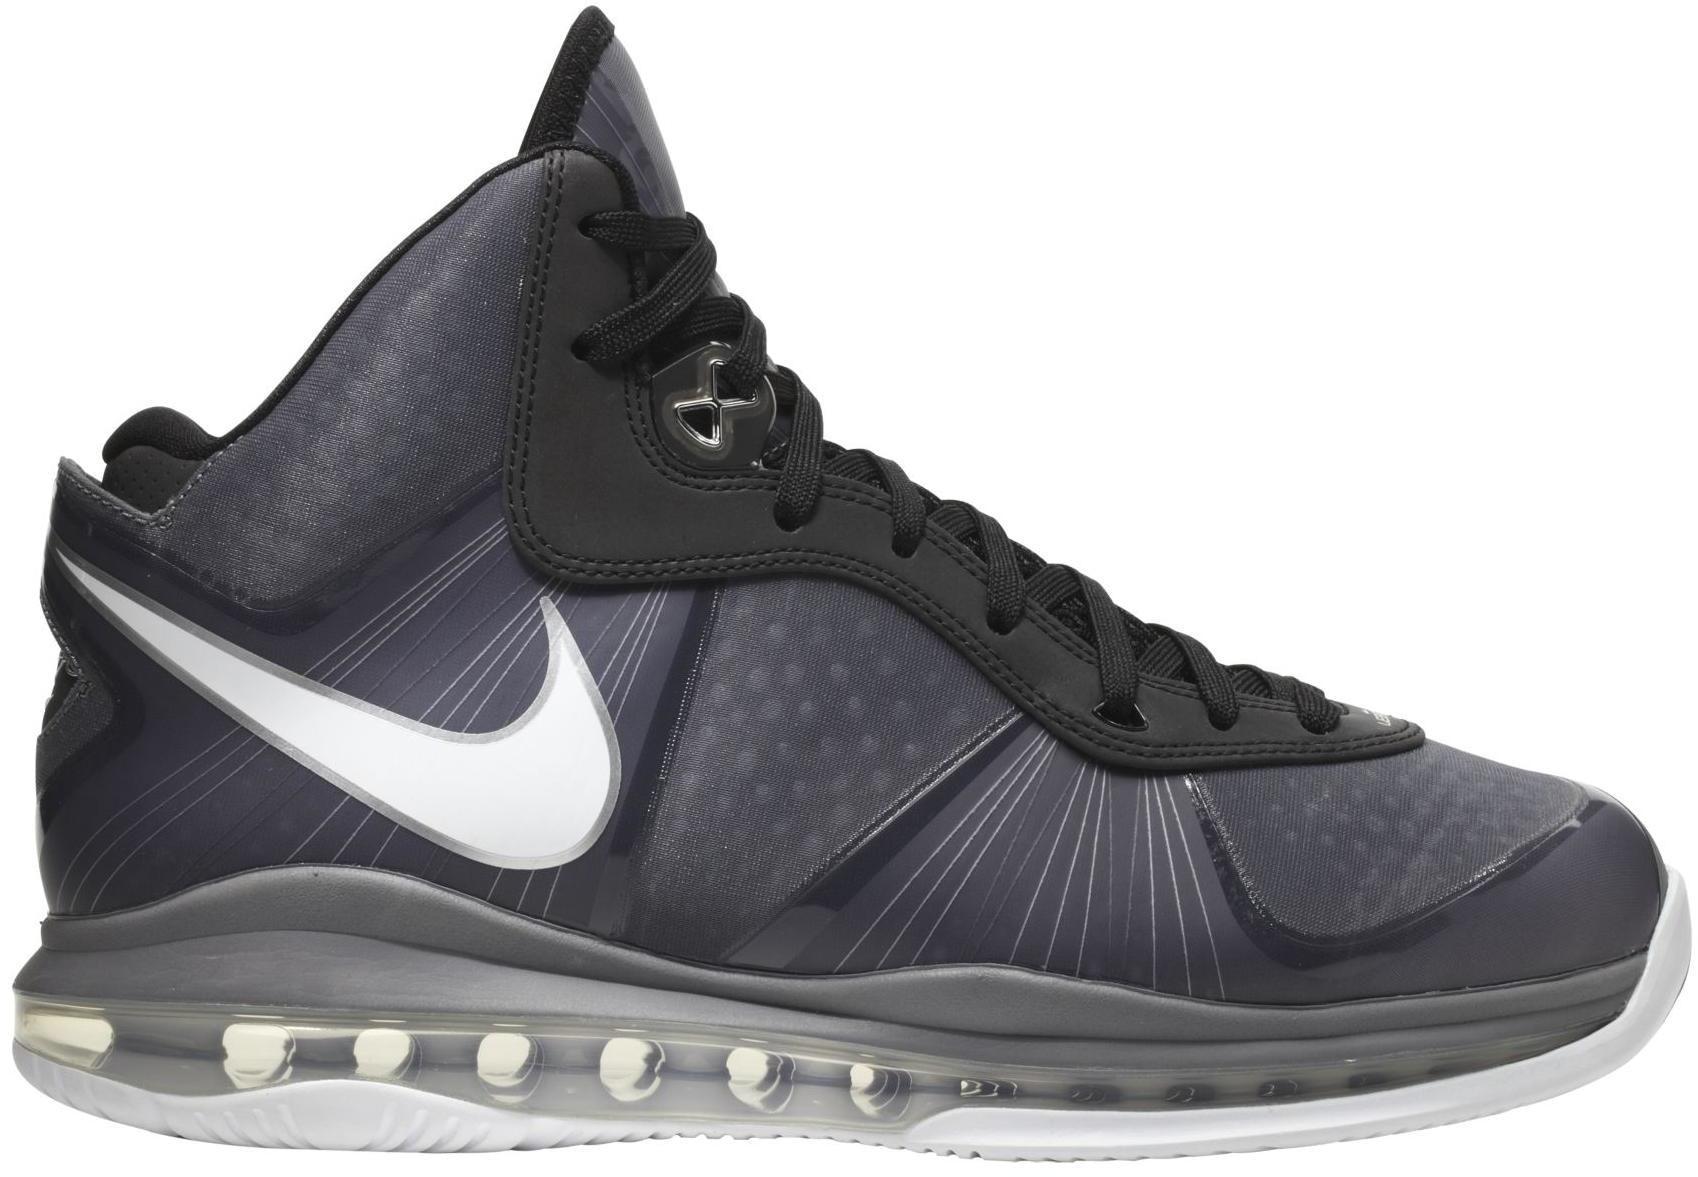 LeBron 8 Cool Grey